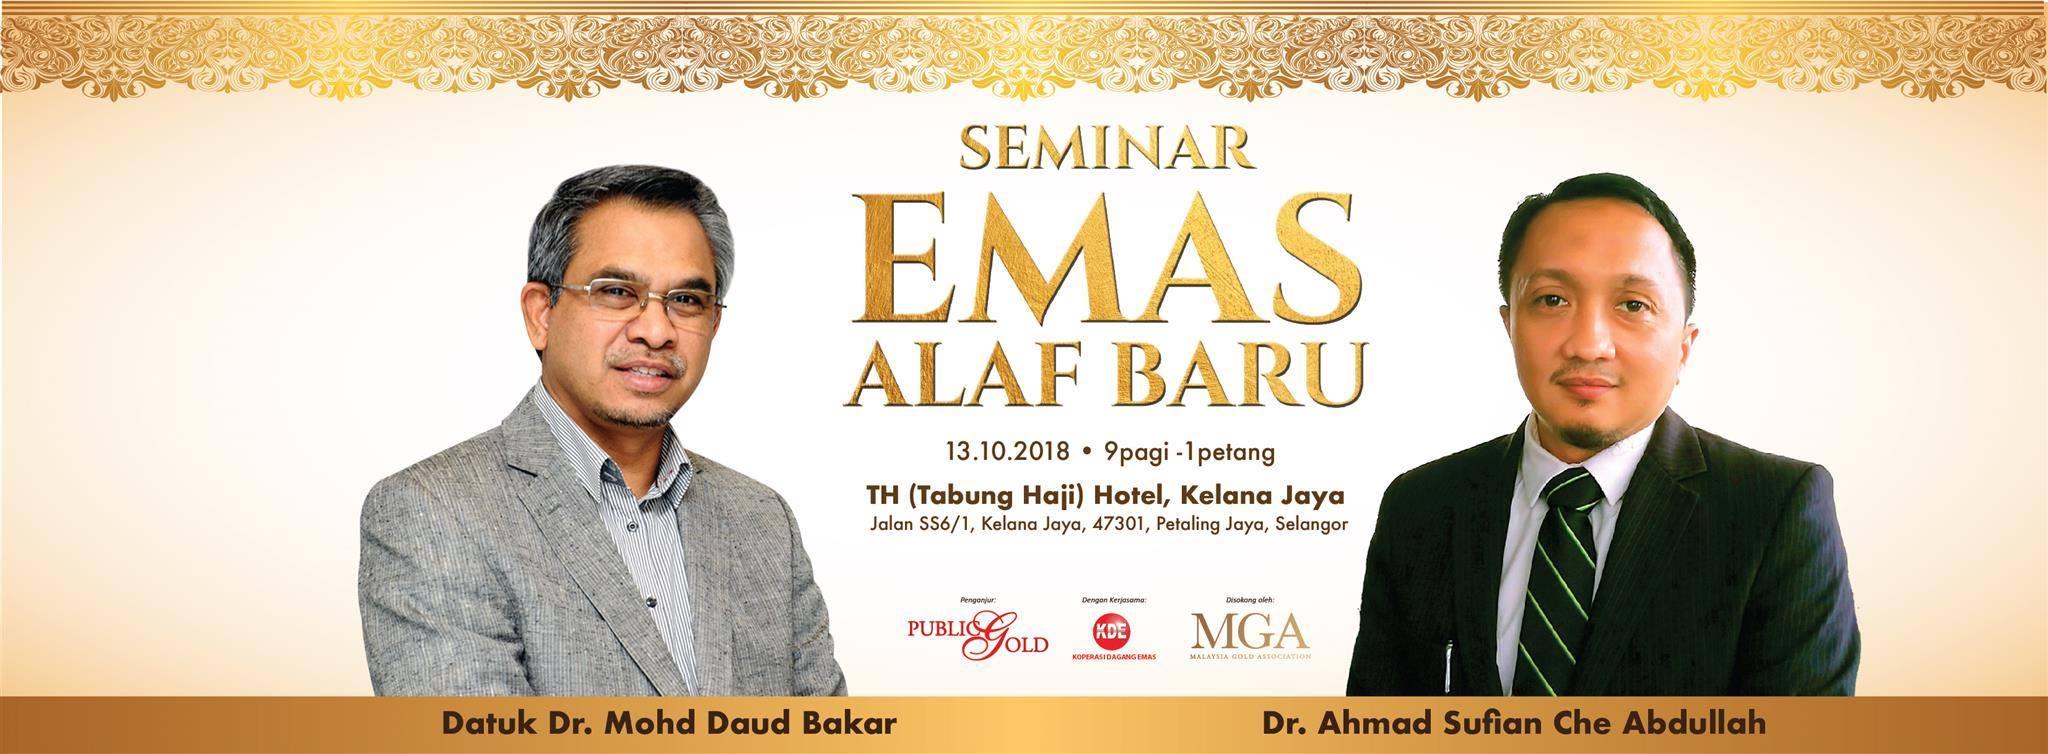 Seminar Emas Alaf Baru 2018